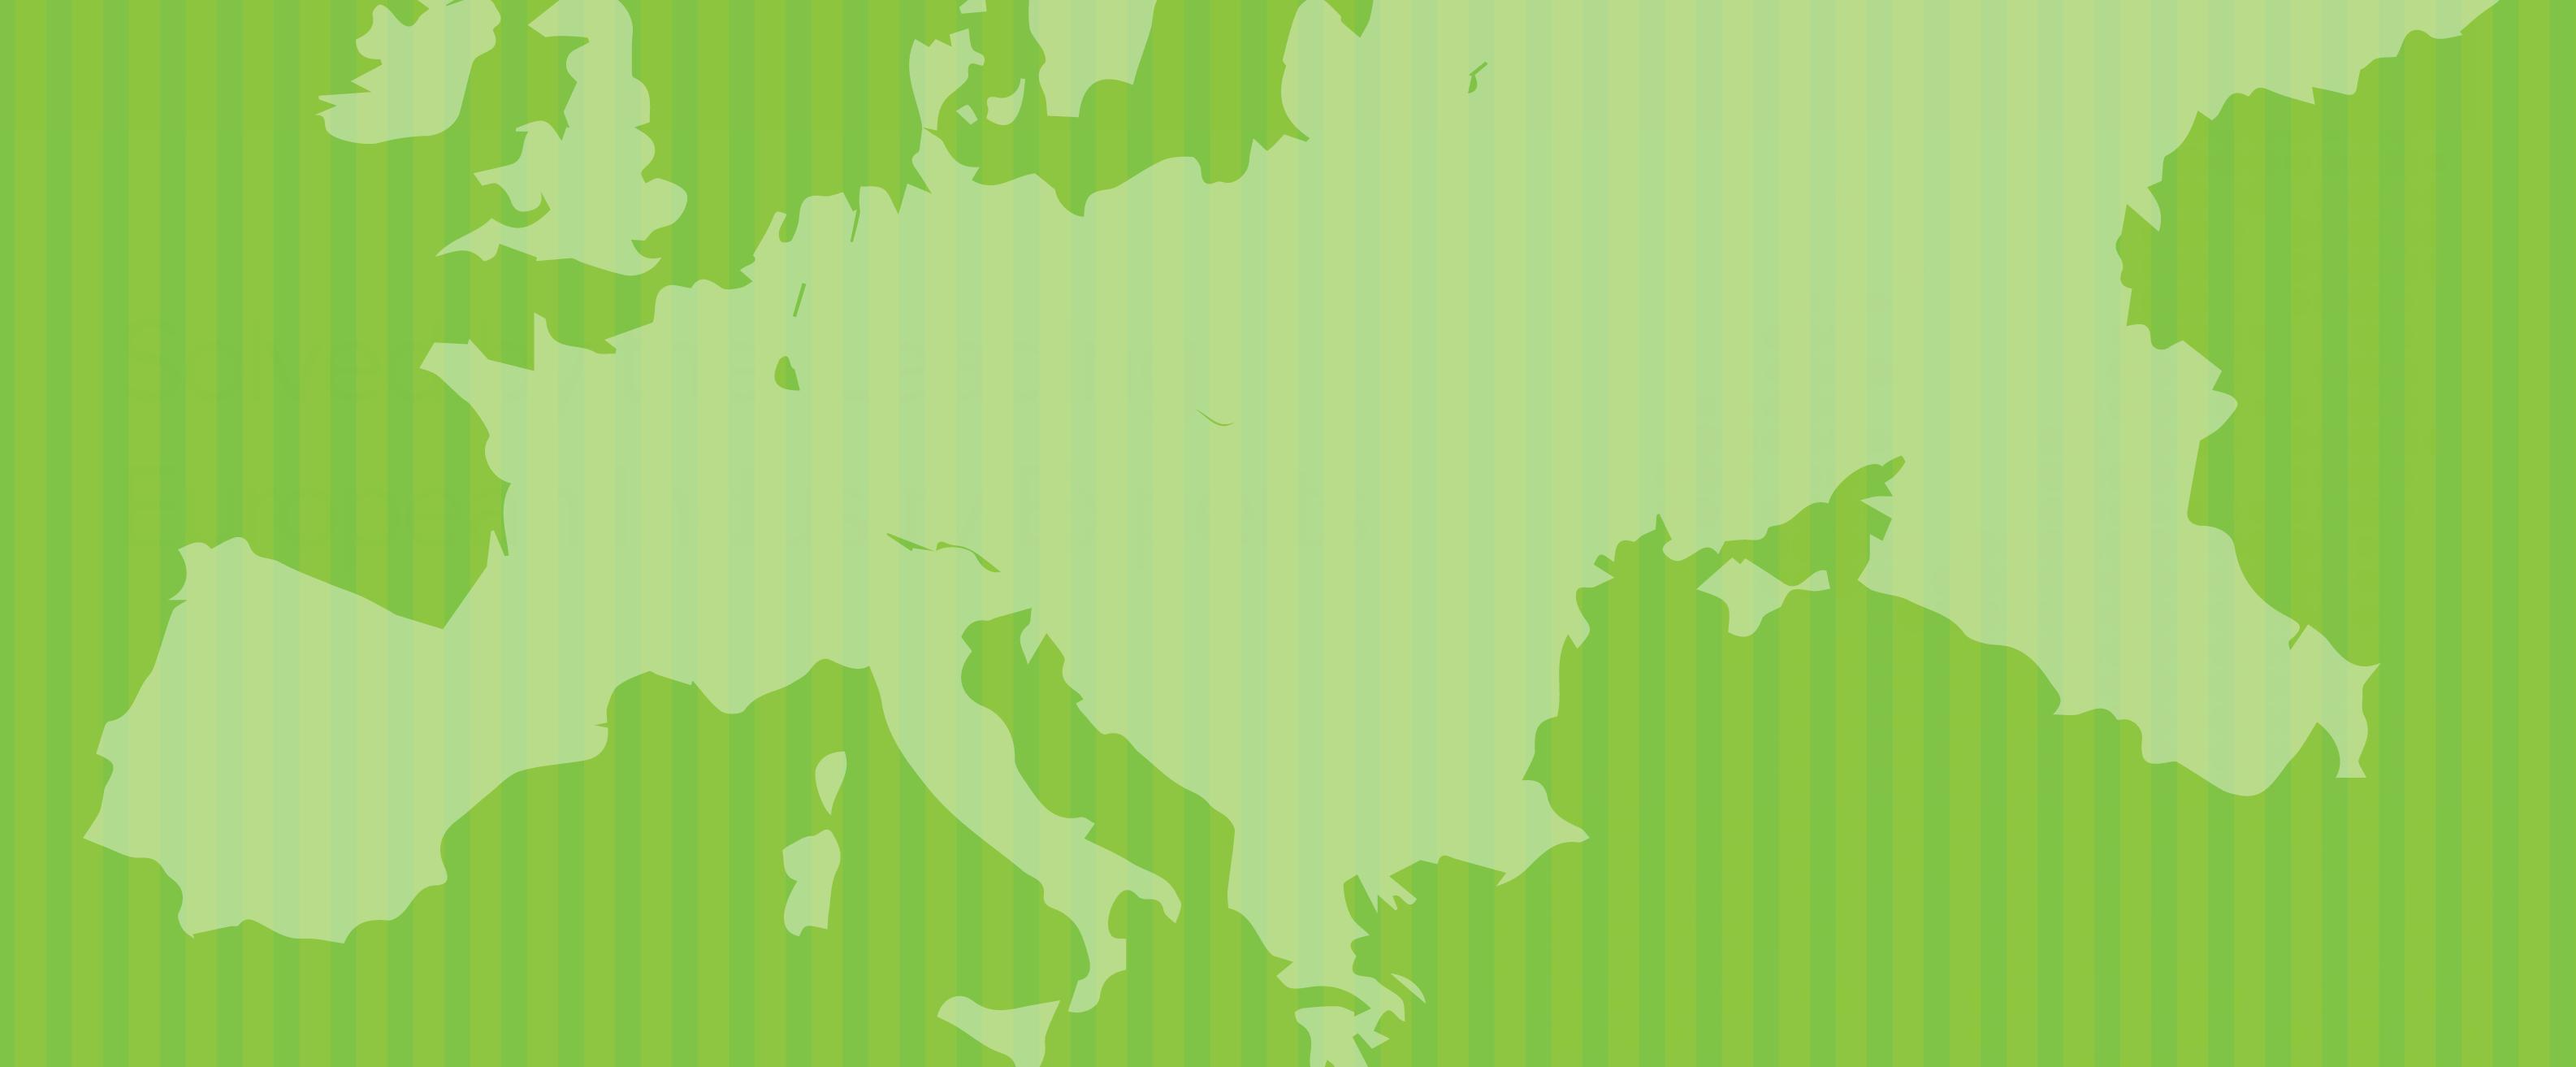 content marketing statistics in Europe